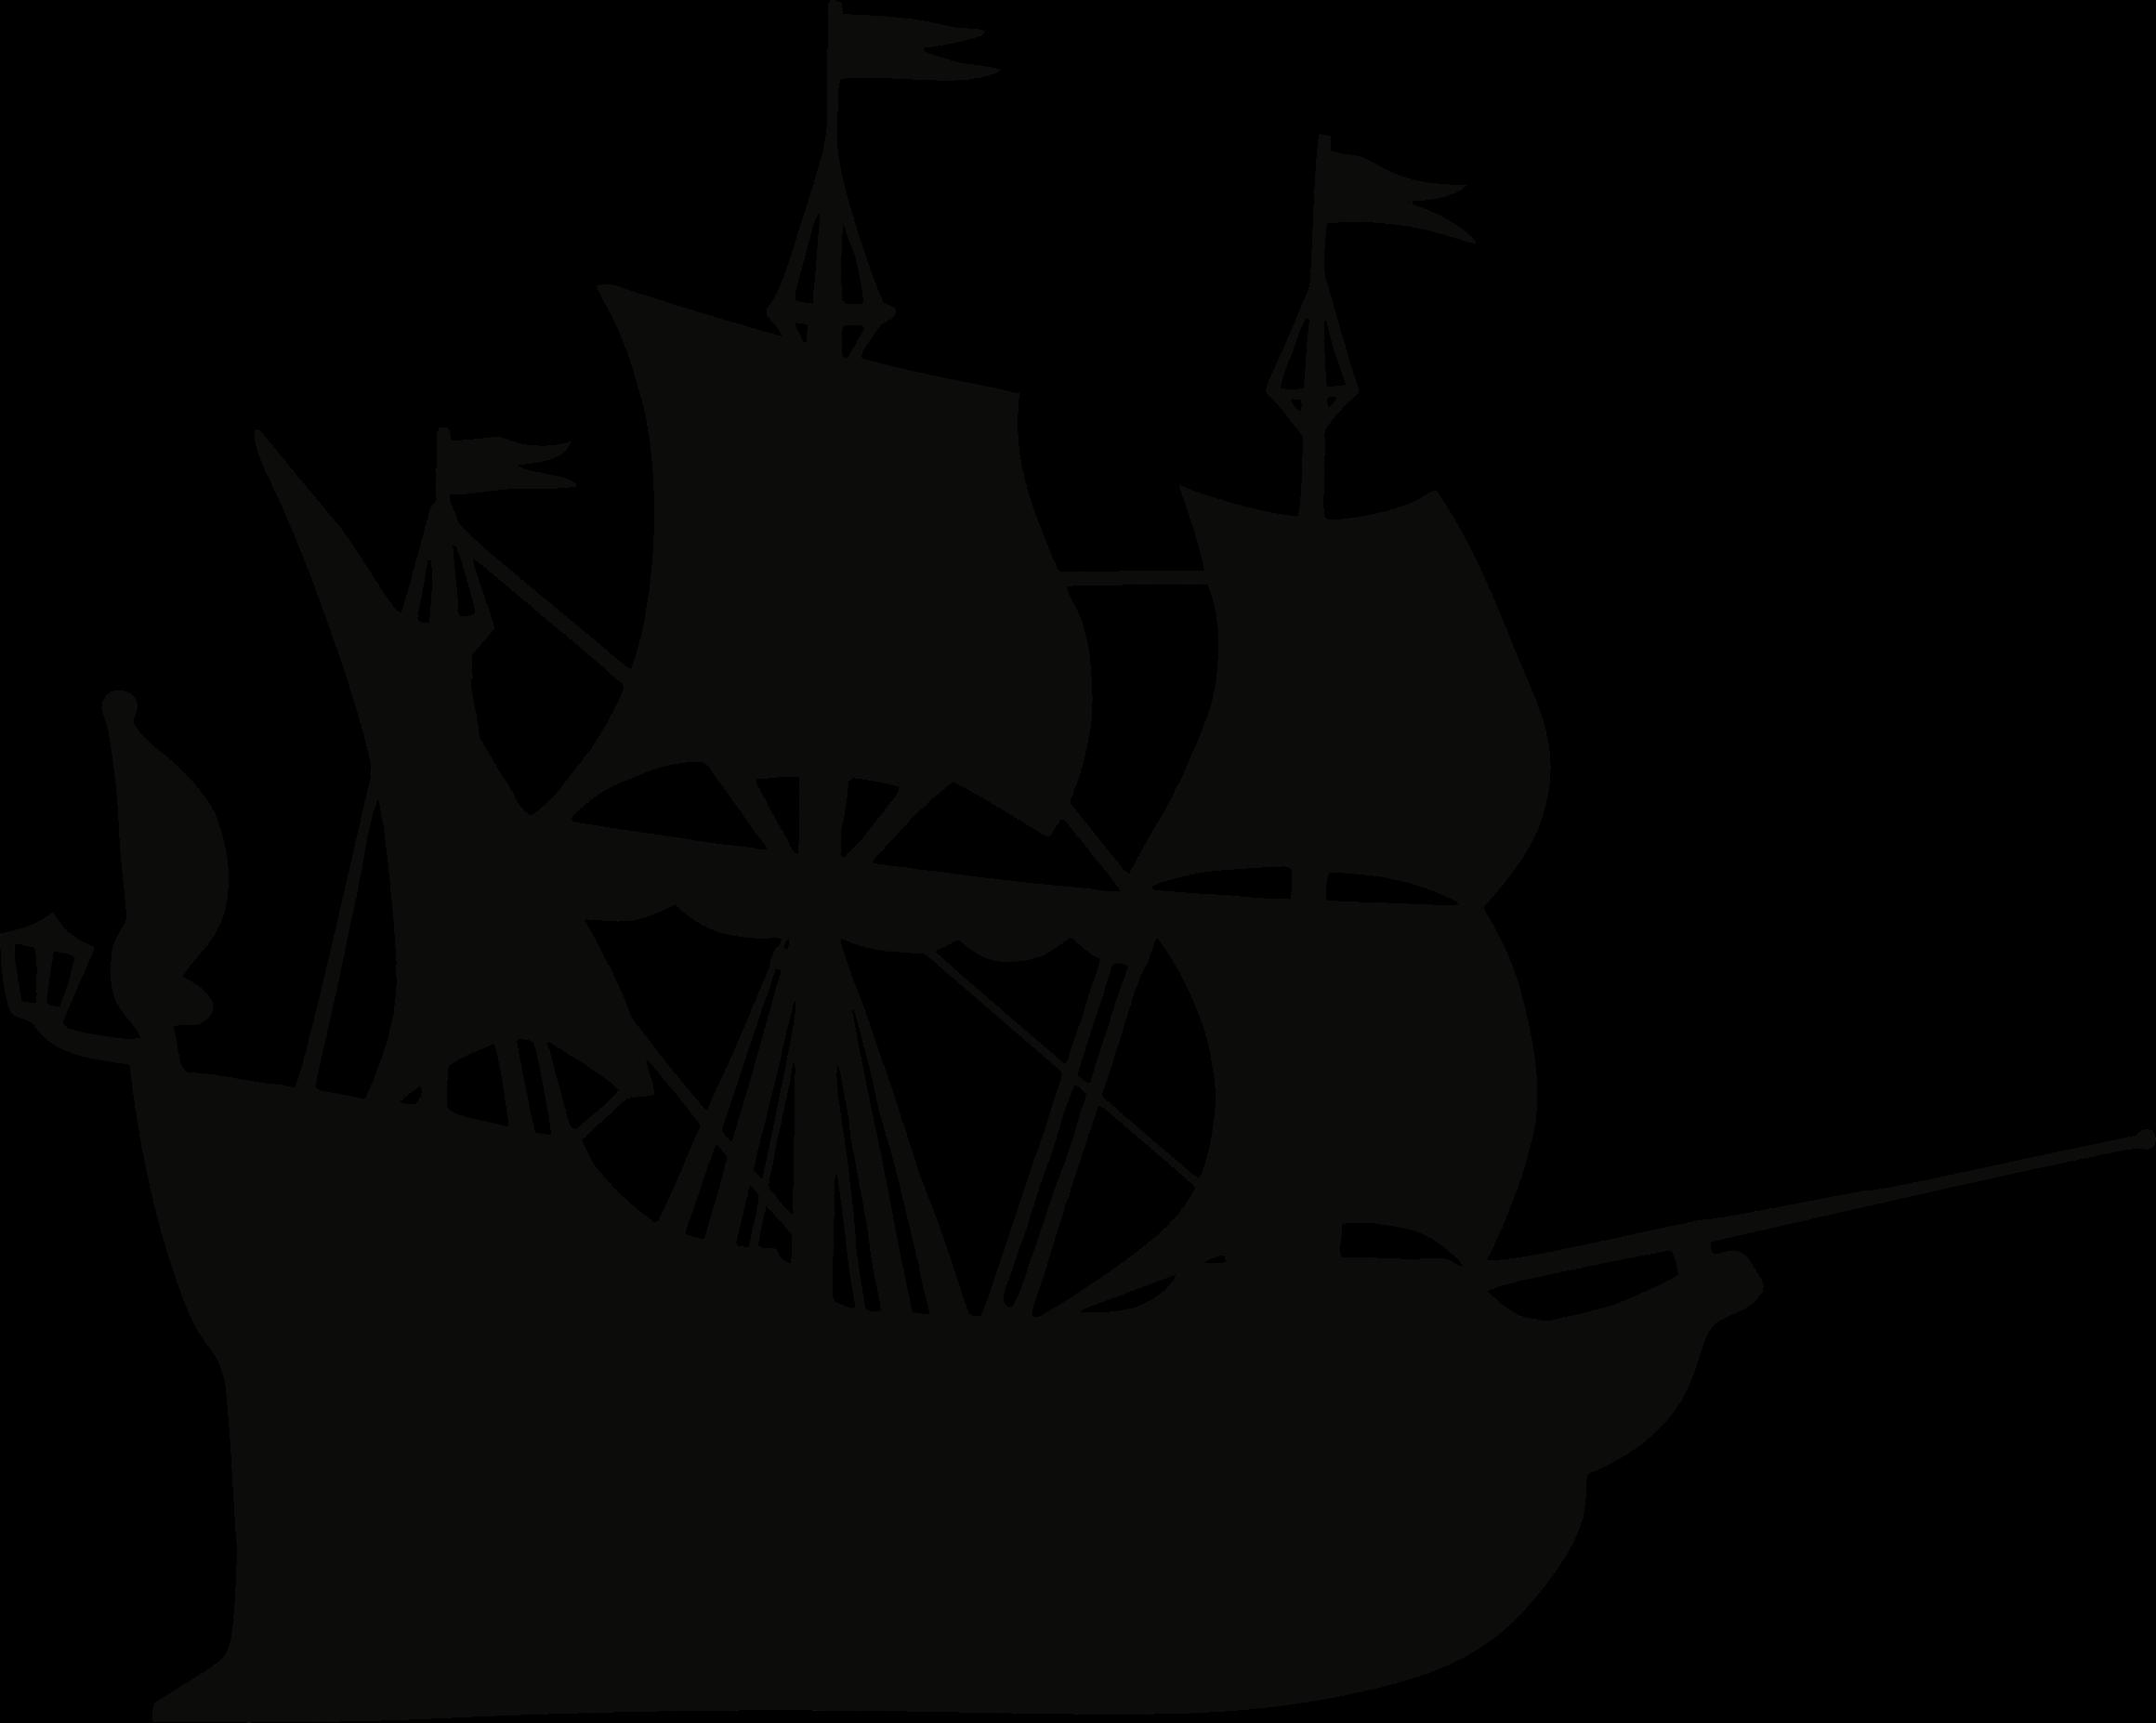 boat silhouette png wwwpixsharkcom images galleries